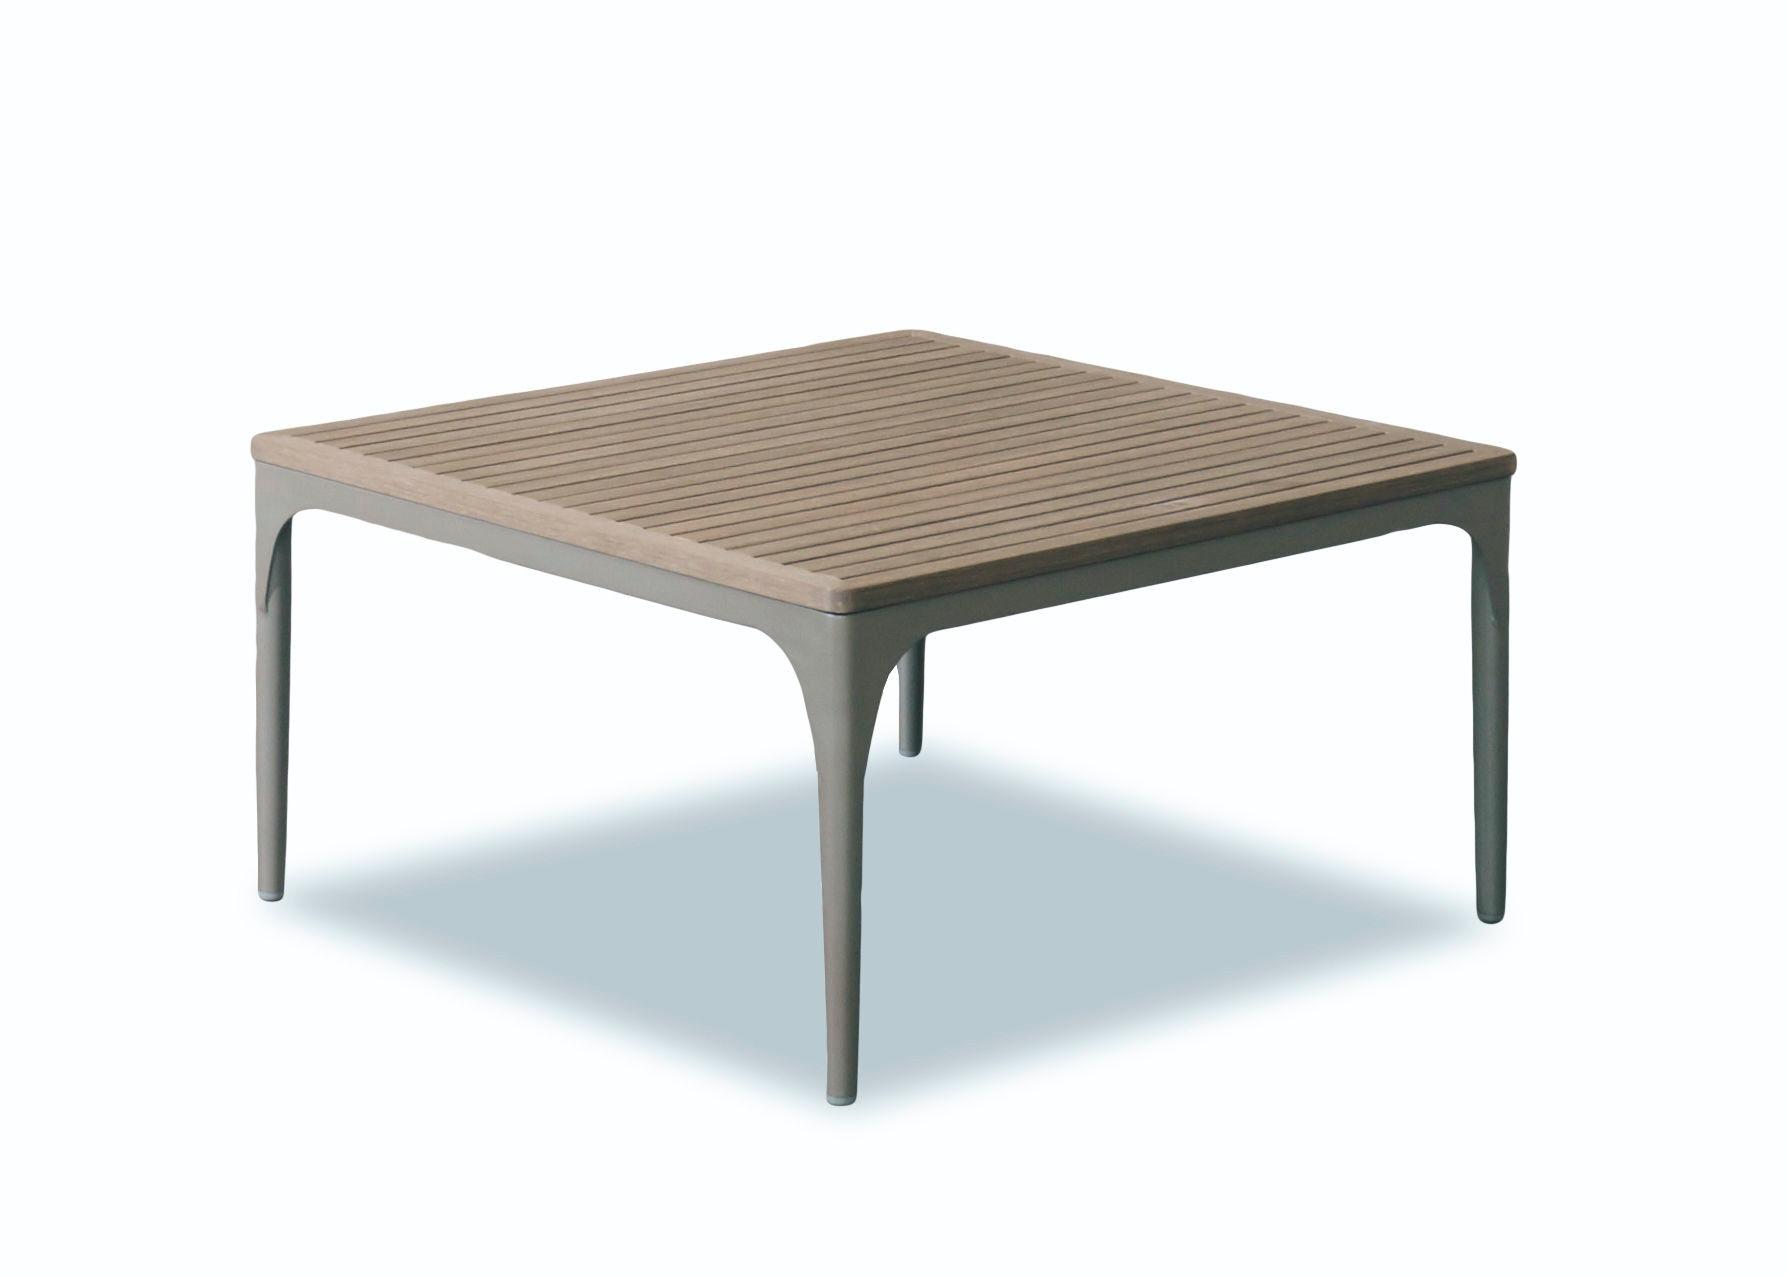 Carolina Preserves Outdoor/Patio Urban Retreat Square Cocktail Table W3500  SQCT At Wrights Furniture U0026 Flooring